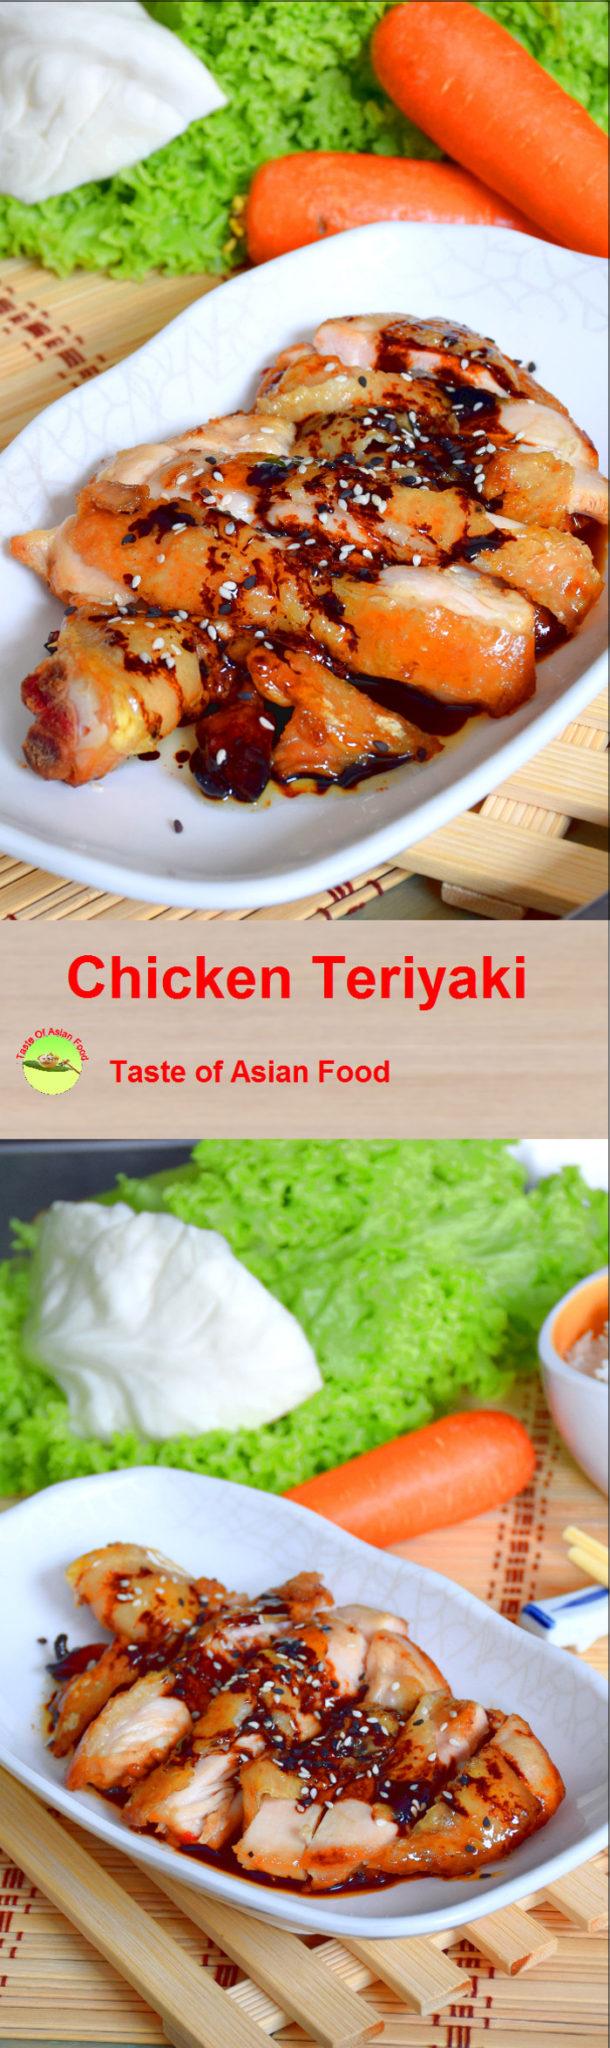 chicken teriyaki recipe pin